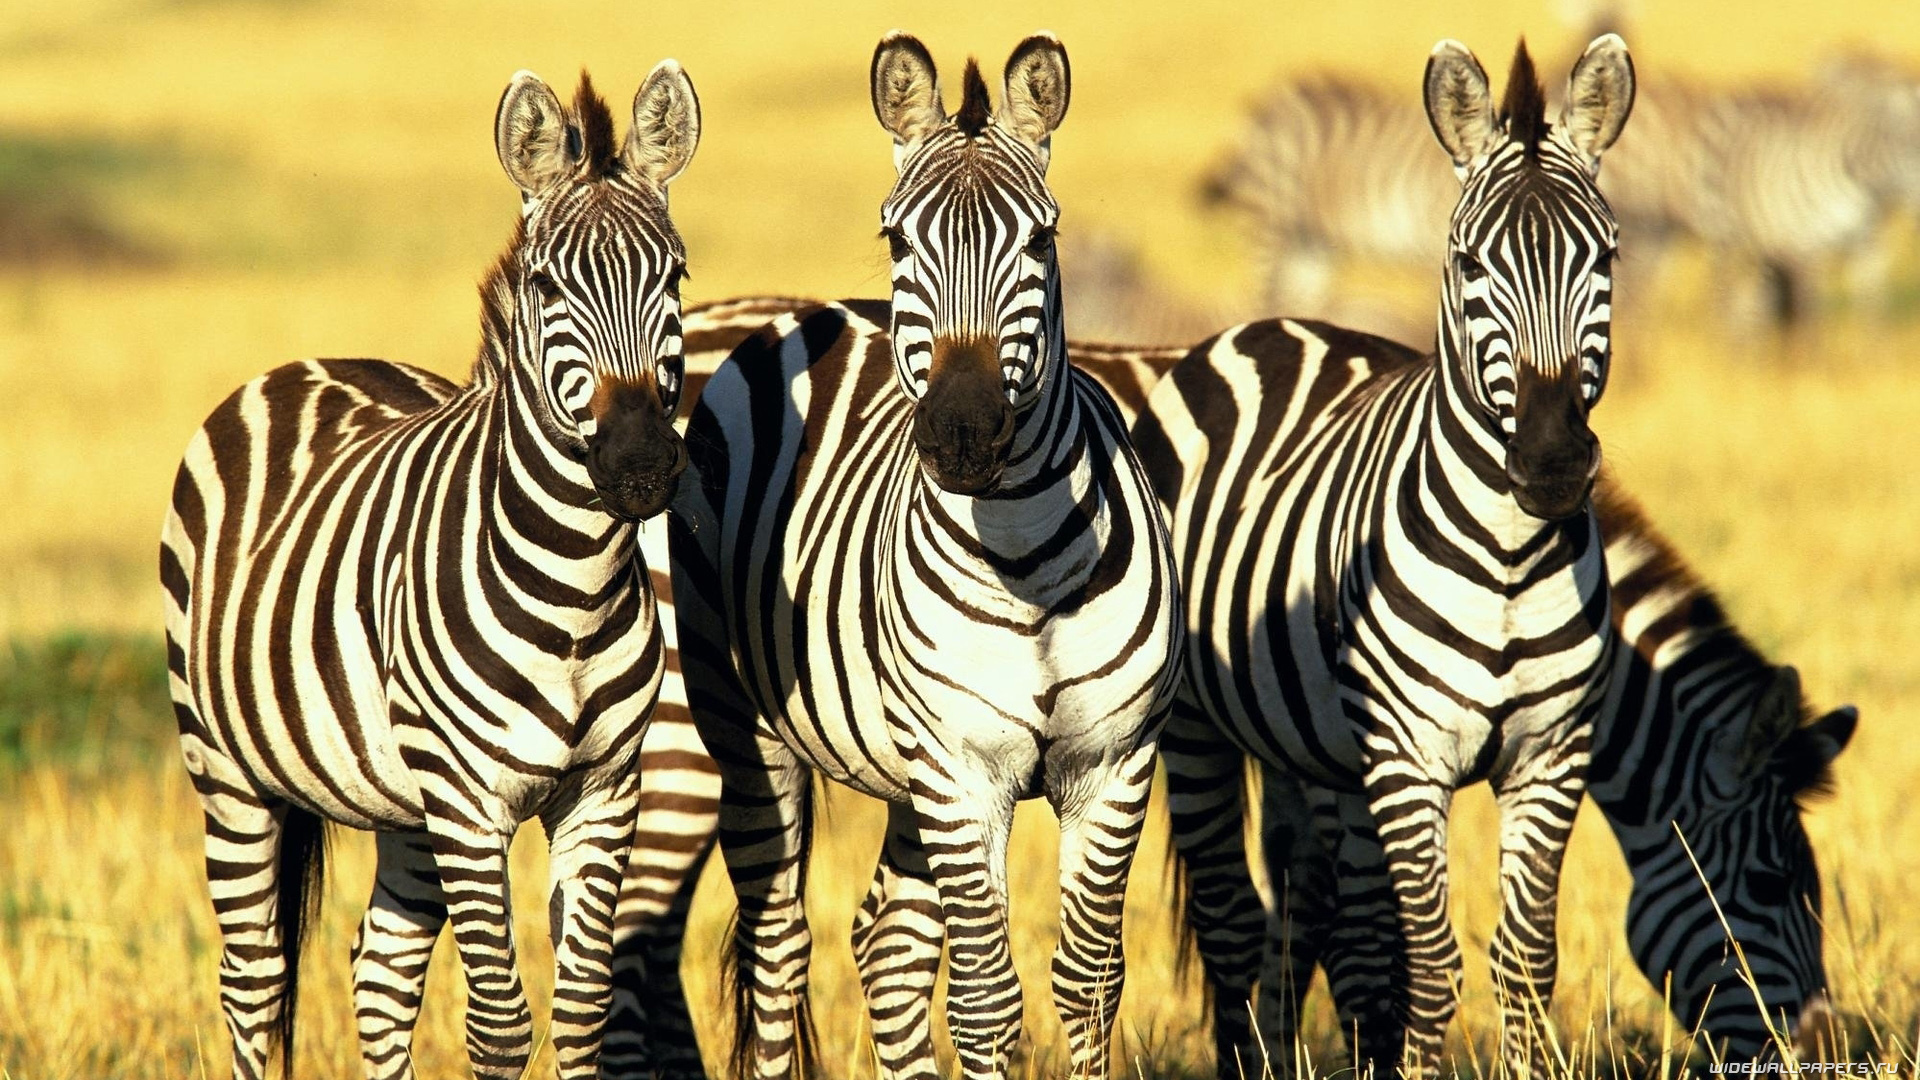 Zebra Wallpaper For Computer